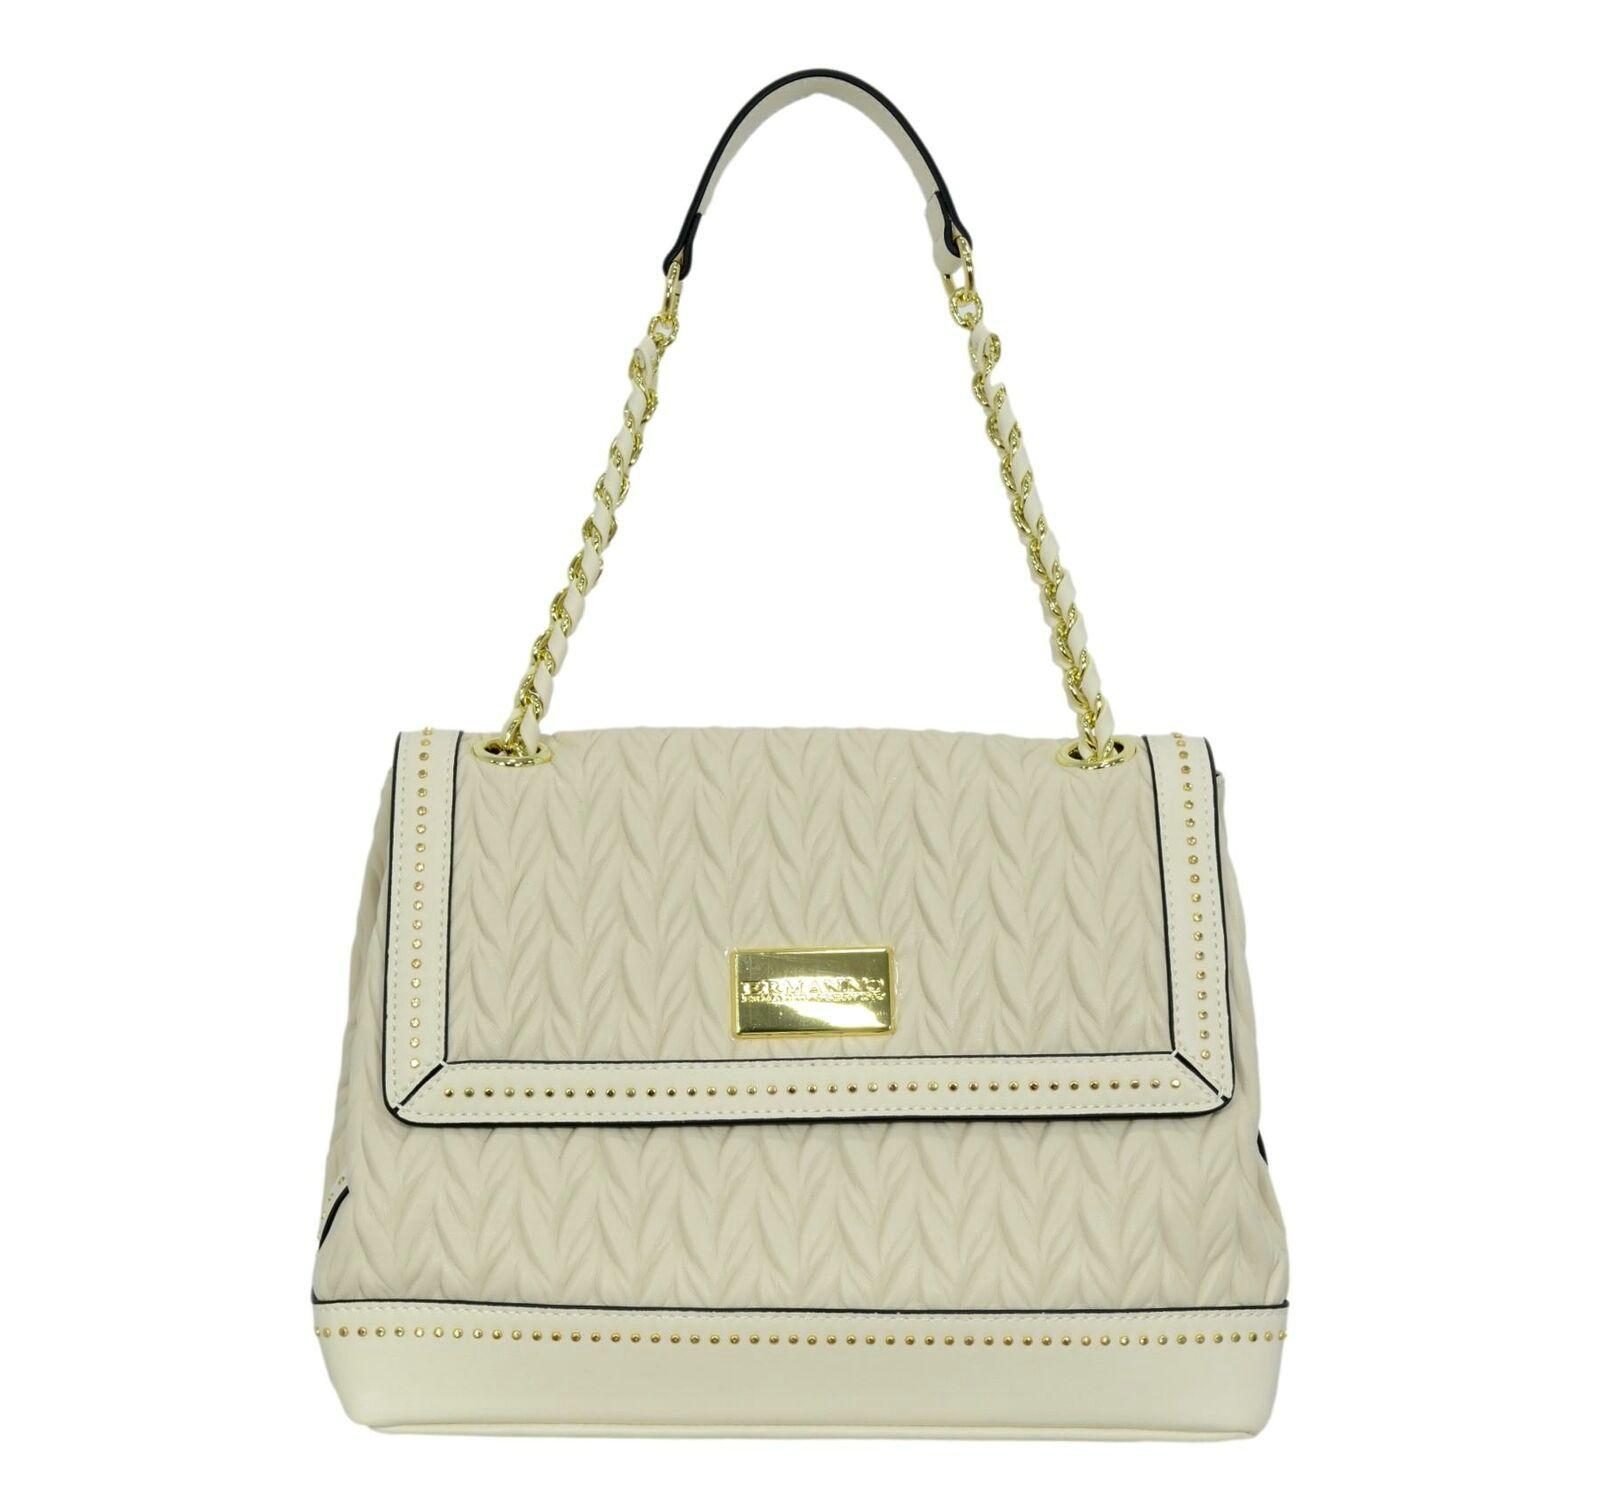 Borsa Ermanno Scervino Flap Bag Juliet 12401176 Avorio